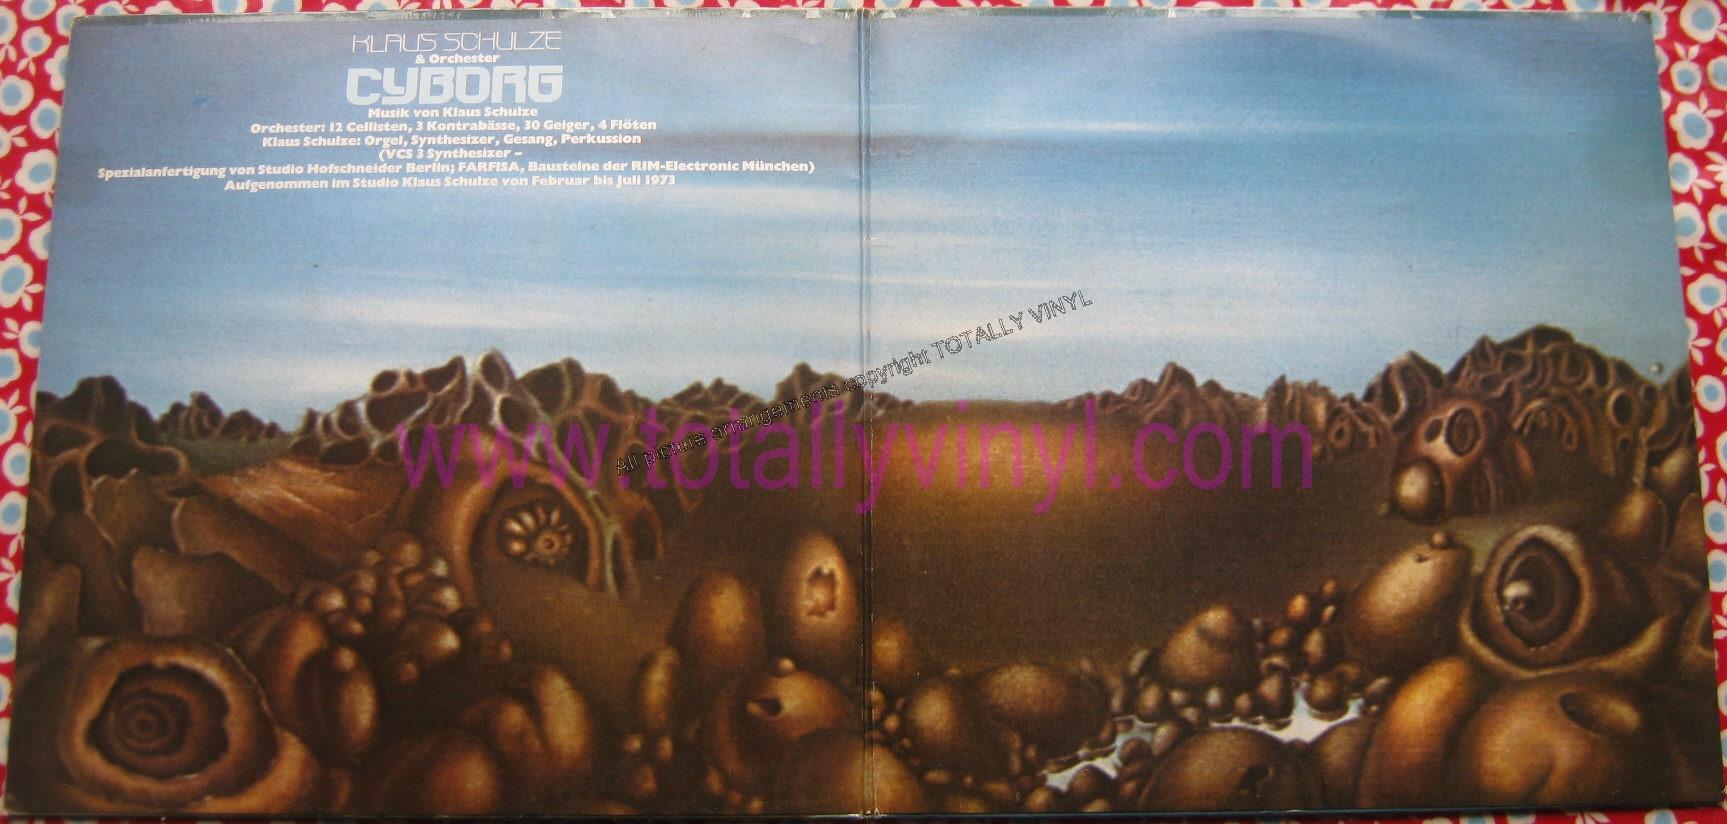 Totally Vinyl Records Schulze Klaus Cyborg Lp